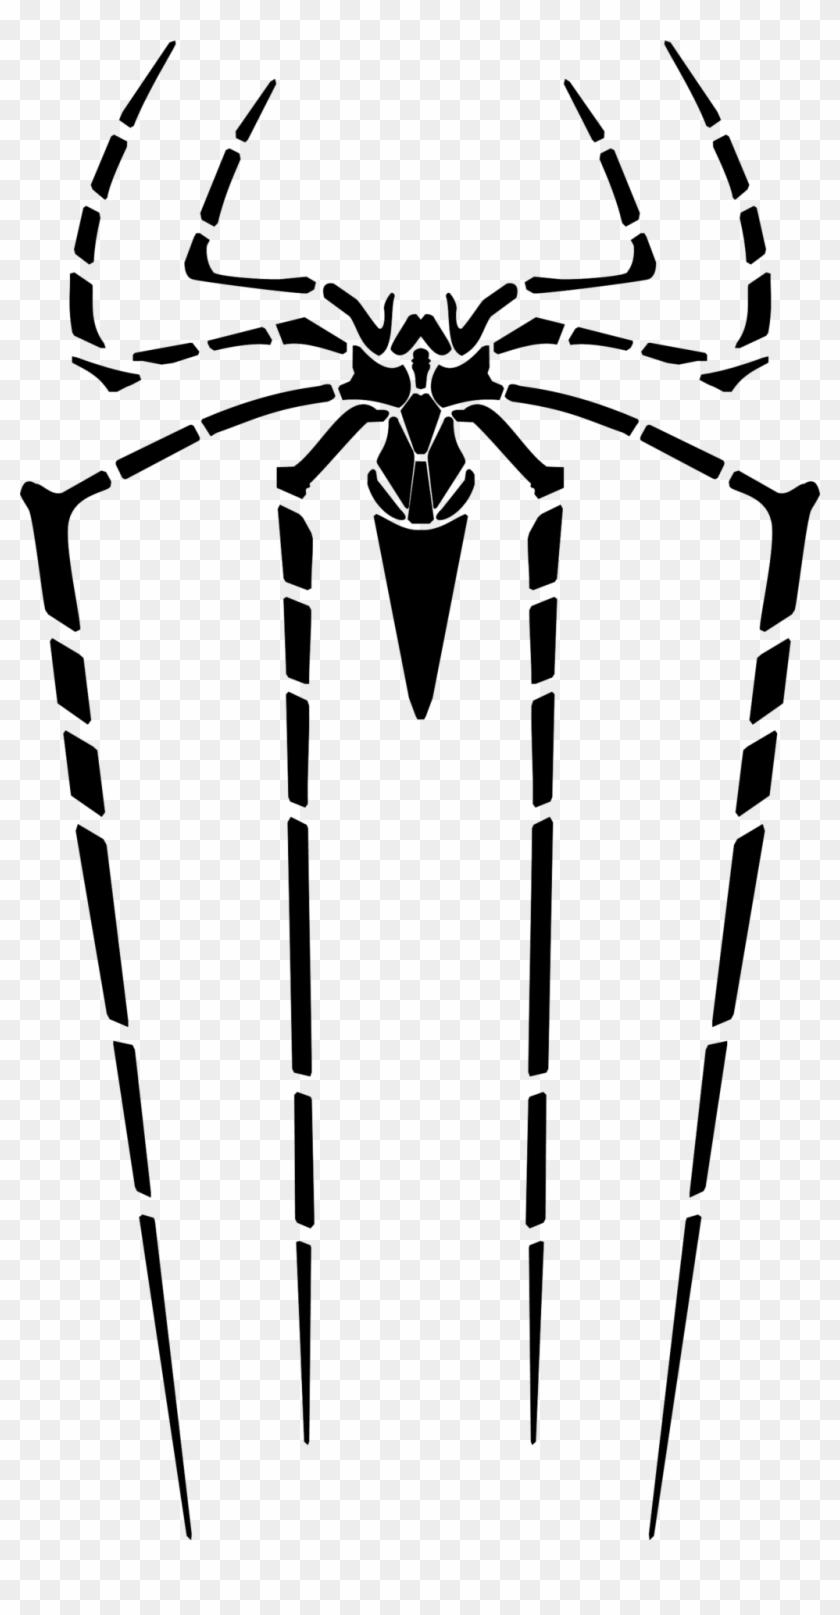 Spiderman Logo 2 By Jmk Prime Amazing Spider Man Symbol Free